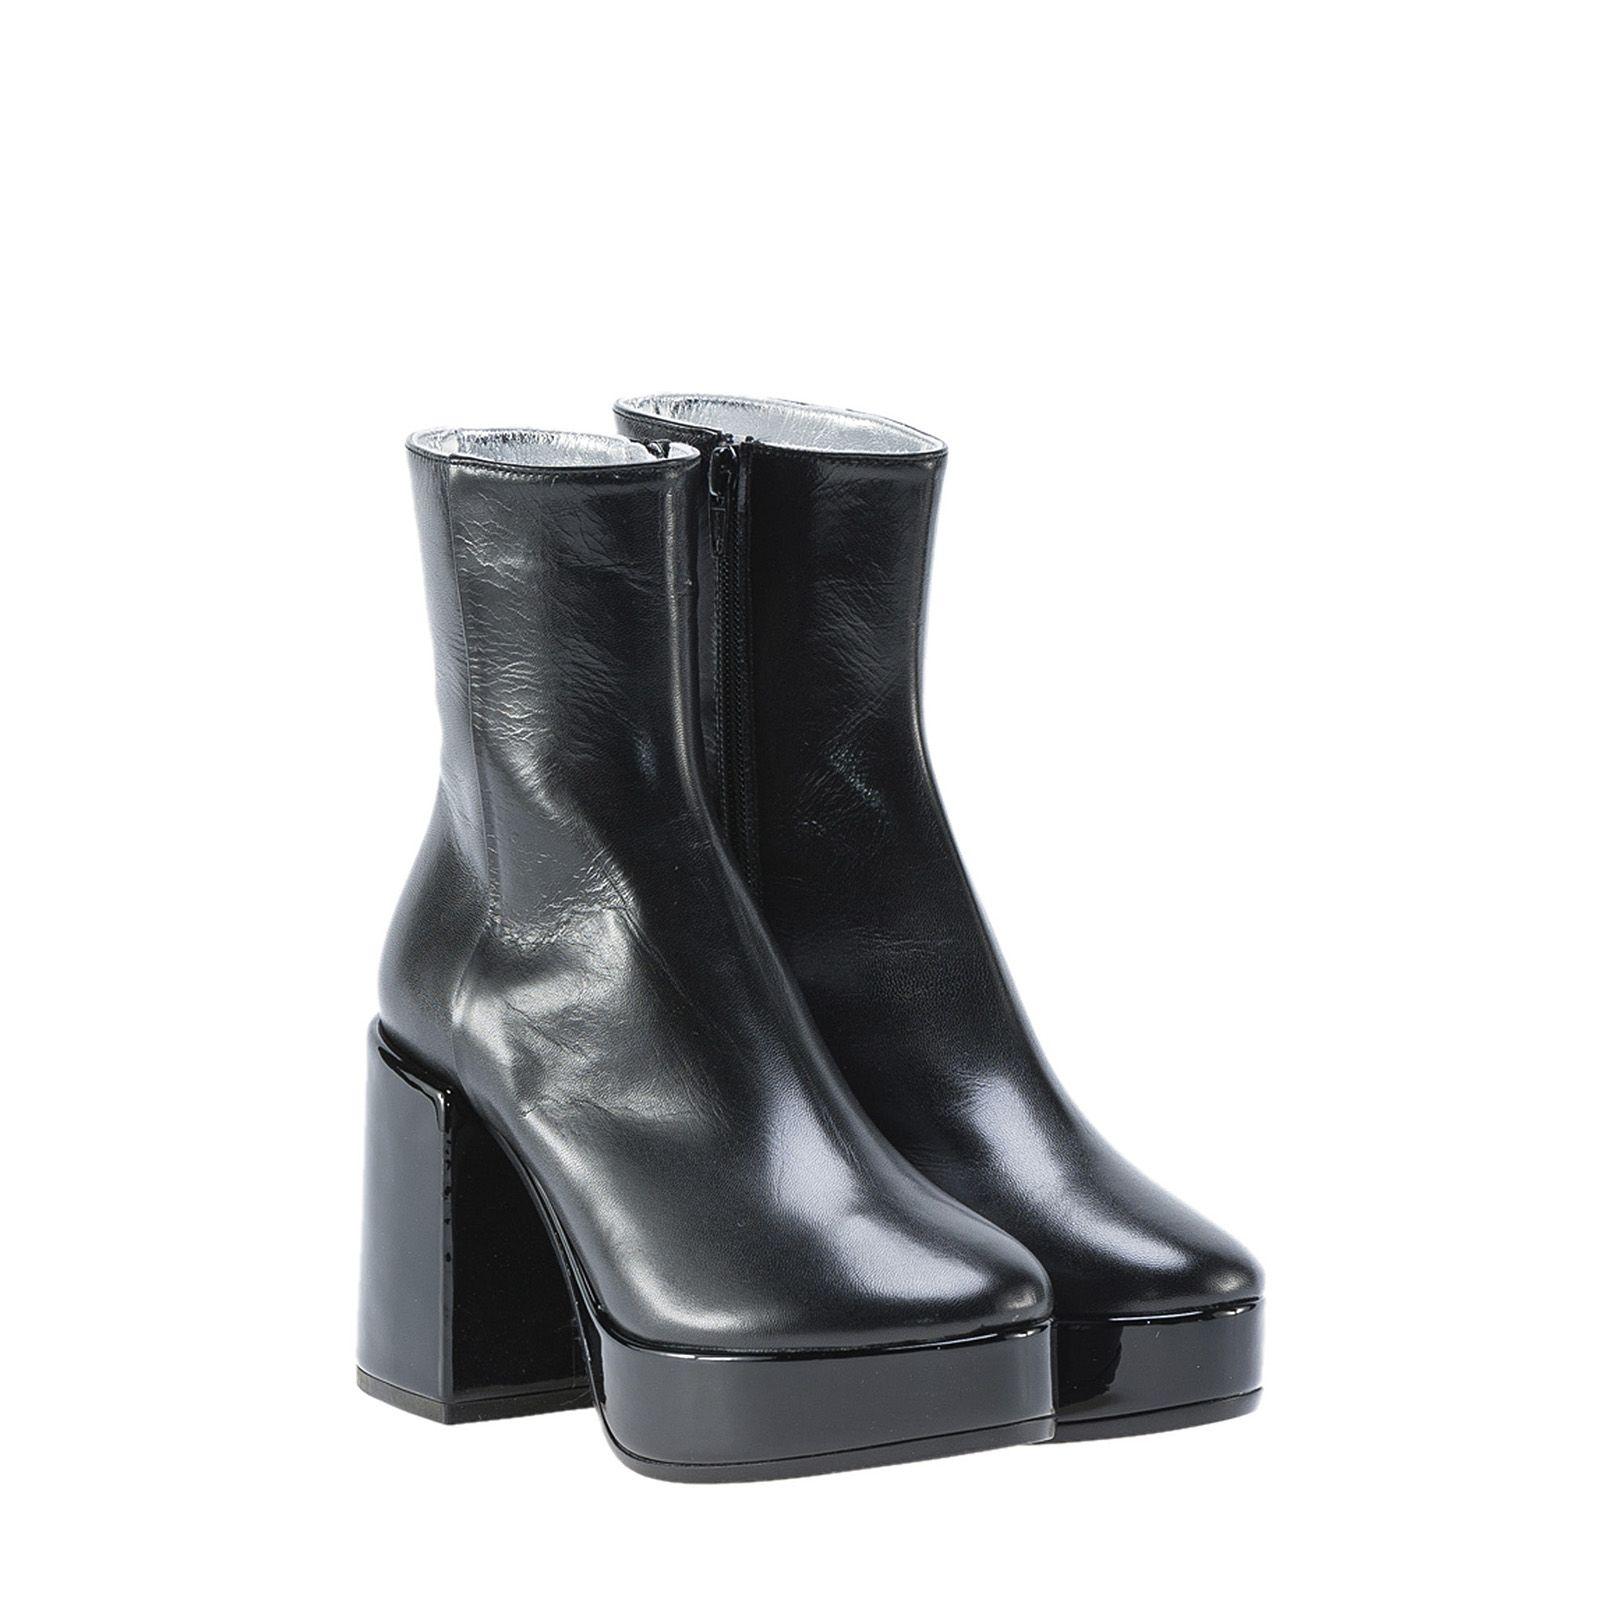 Mm6 Maison Margiela Platform Boots